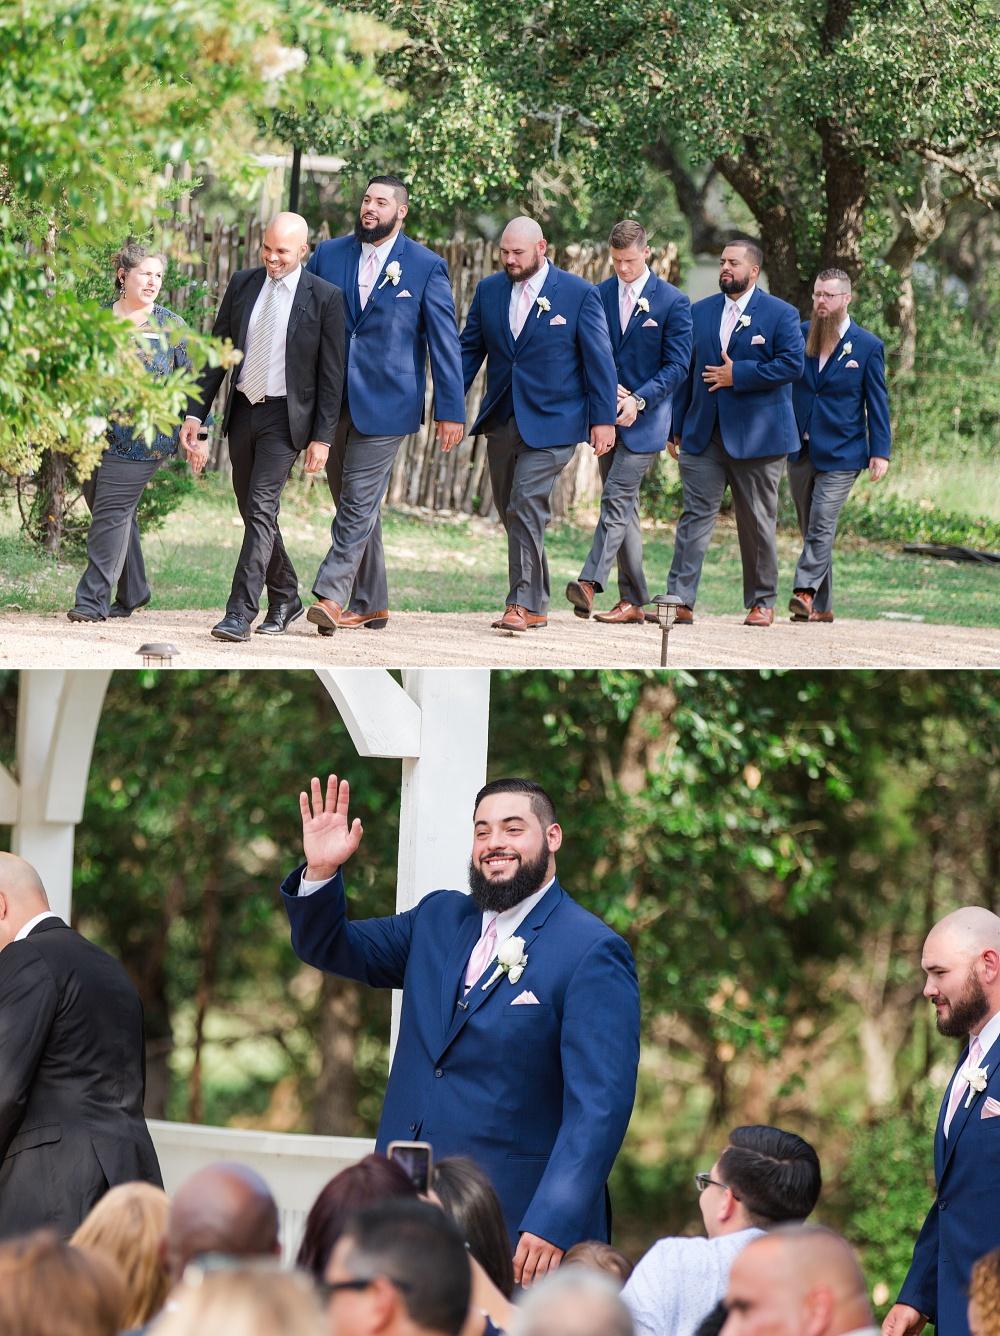 Wedding-Photographer-Bulverde-Texas-Western-Sky-Event-Venue-Carly-Barton-Photography_0039.jpg